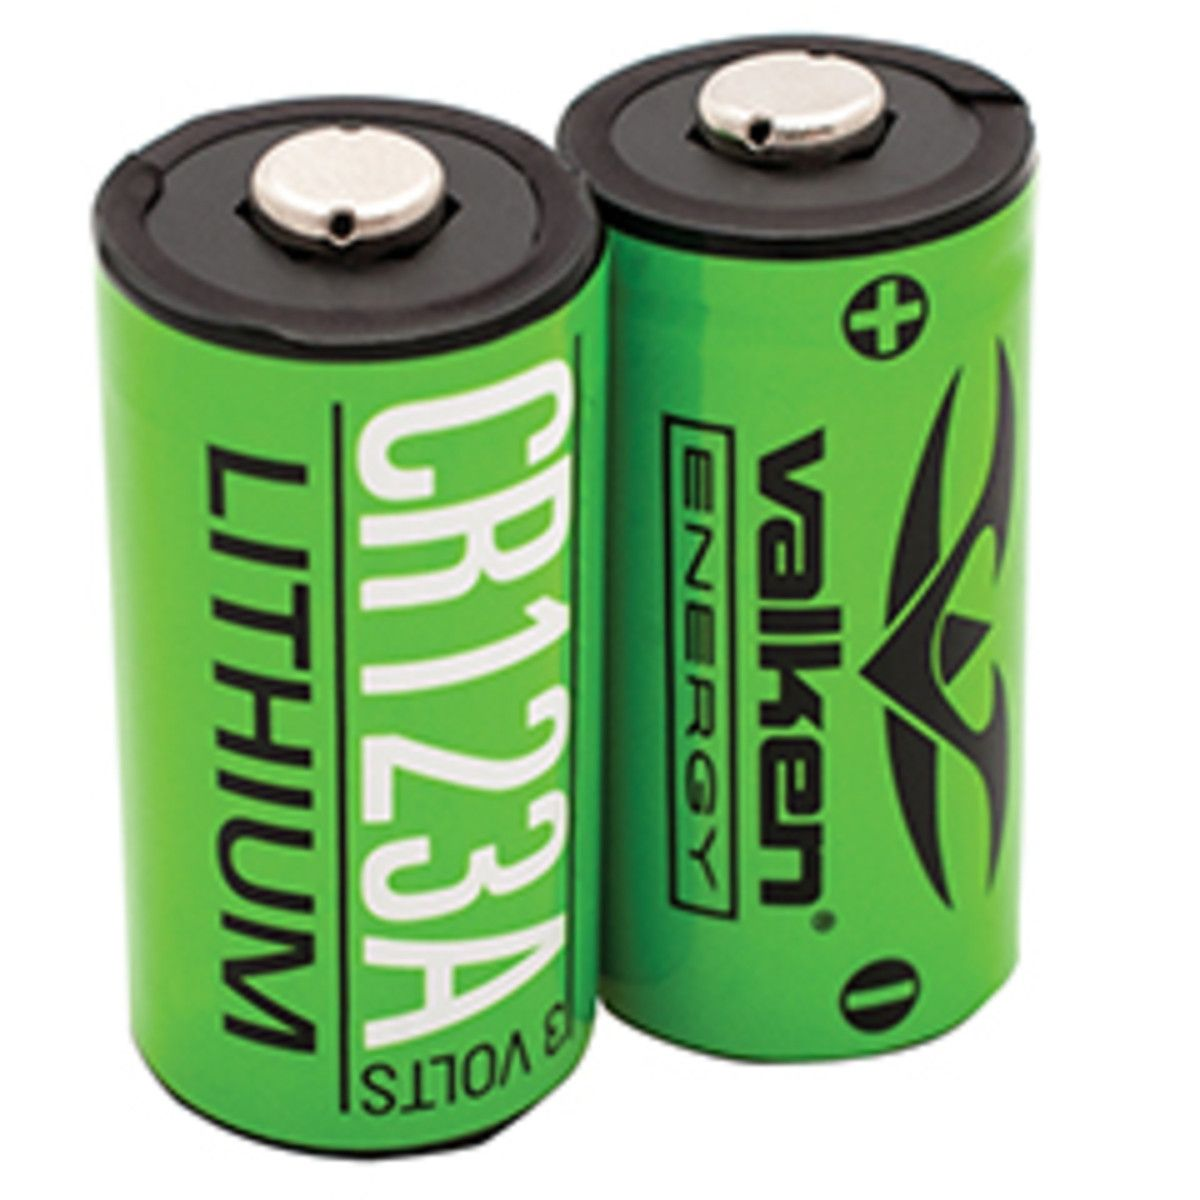 Mr Batt C Rechargeable Batteries 4 Pack 5000mah Battery Cases Rechargeable Batteries Charge Battery